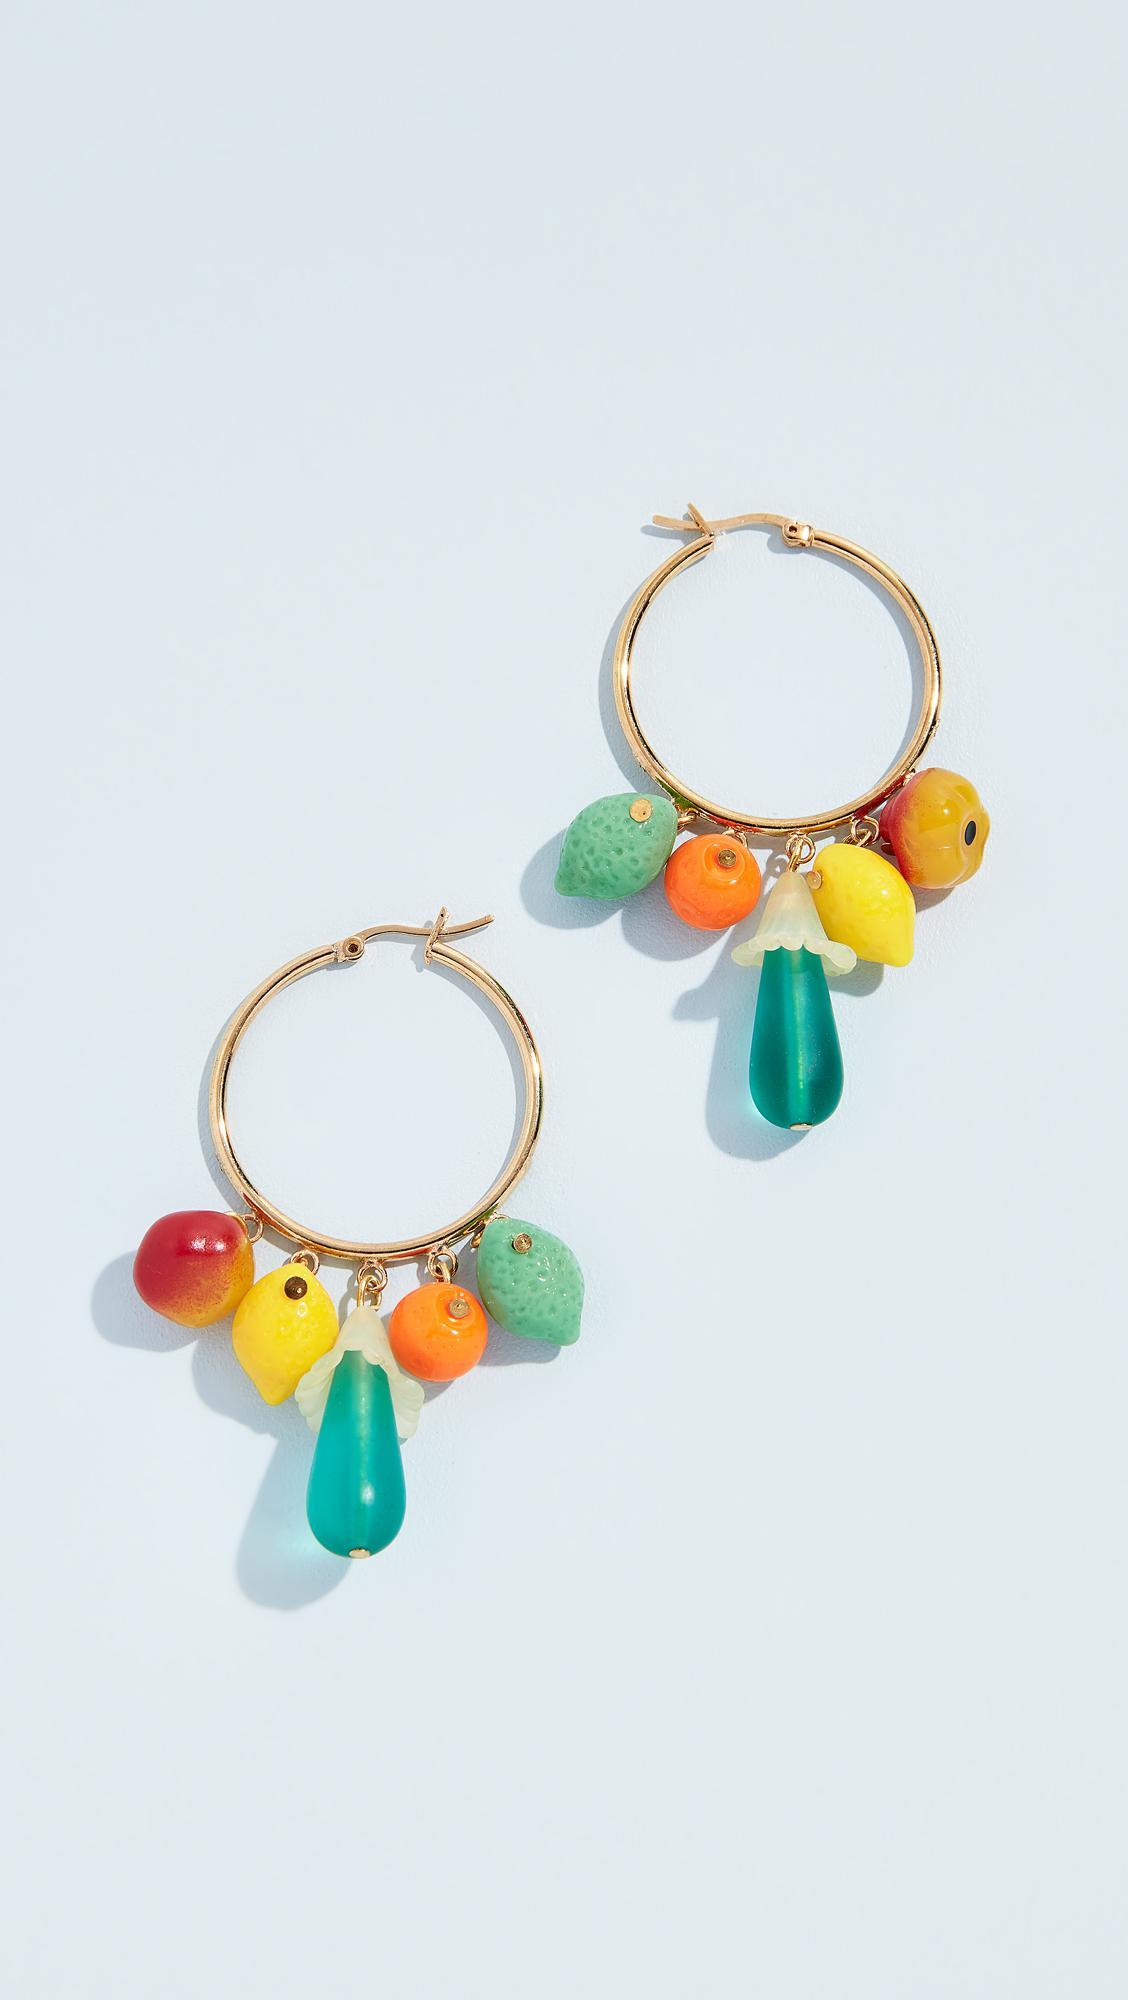 Holst + Lee Fruits of Paradise Earrings A3zv2vEeF